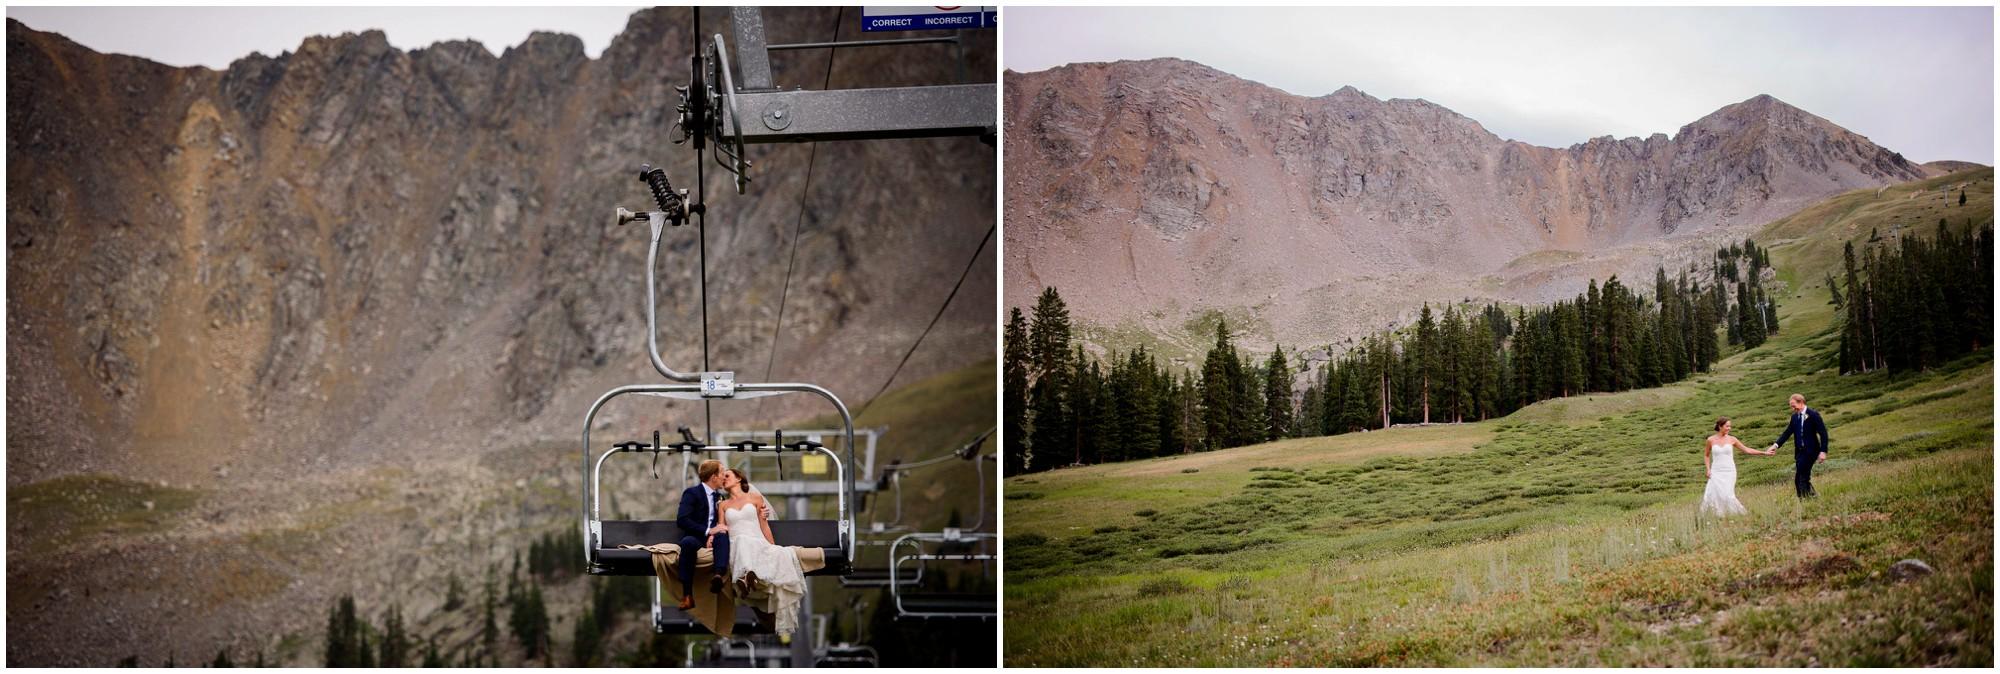 835-Arapahoe-Basin-Black-Mountain-lodge-wedding-photography.jpg